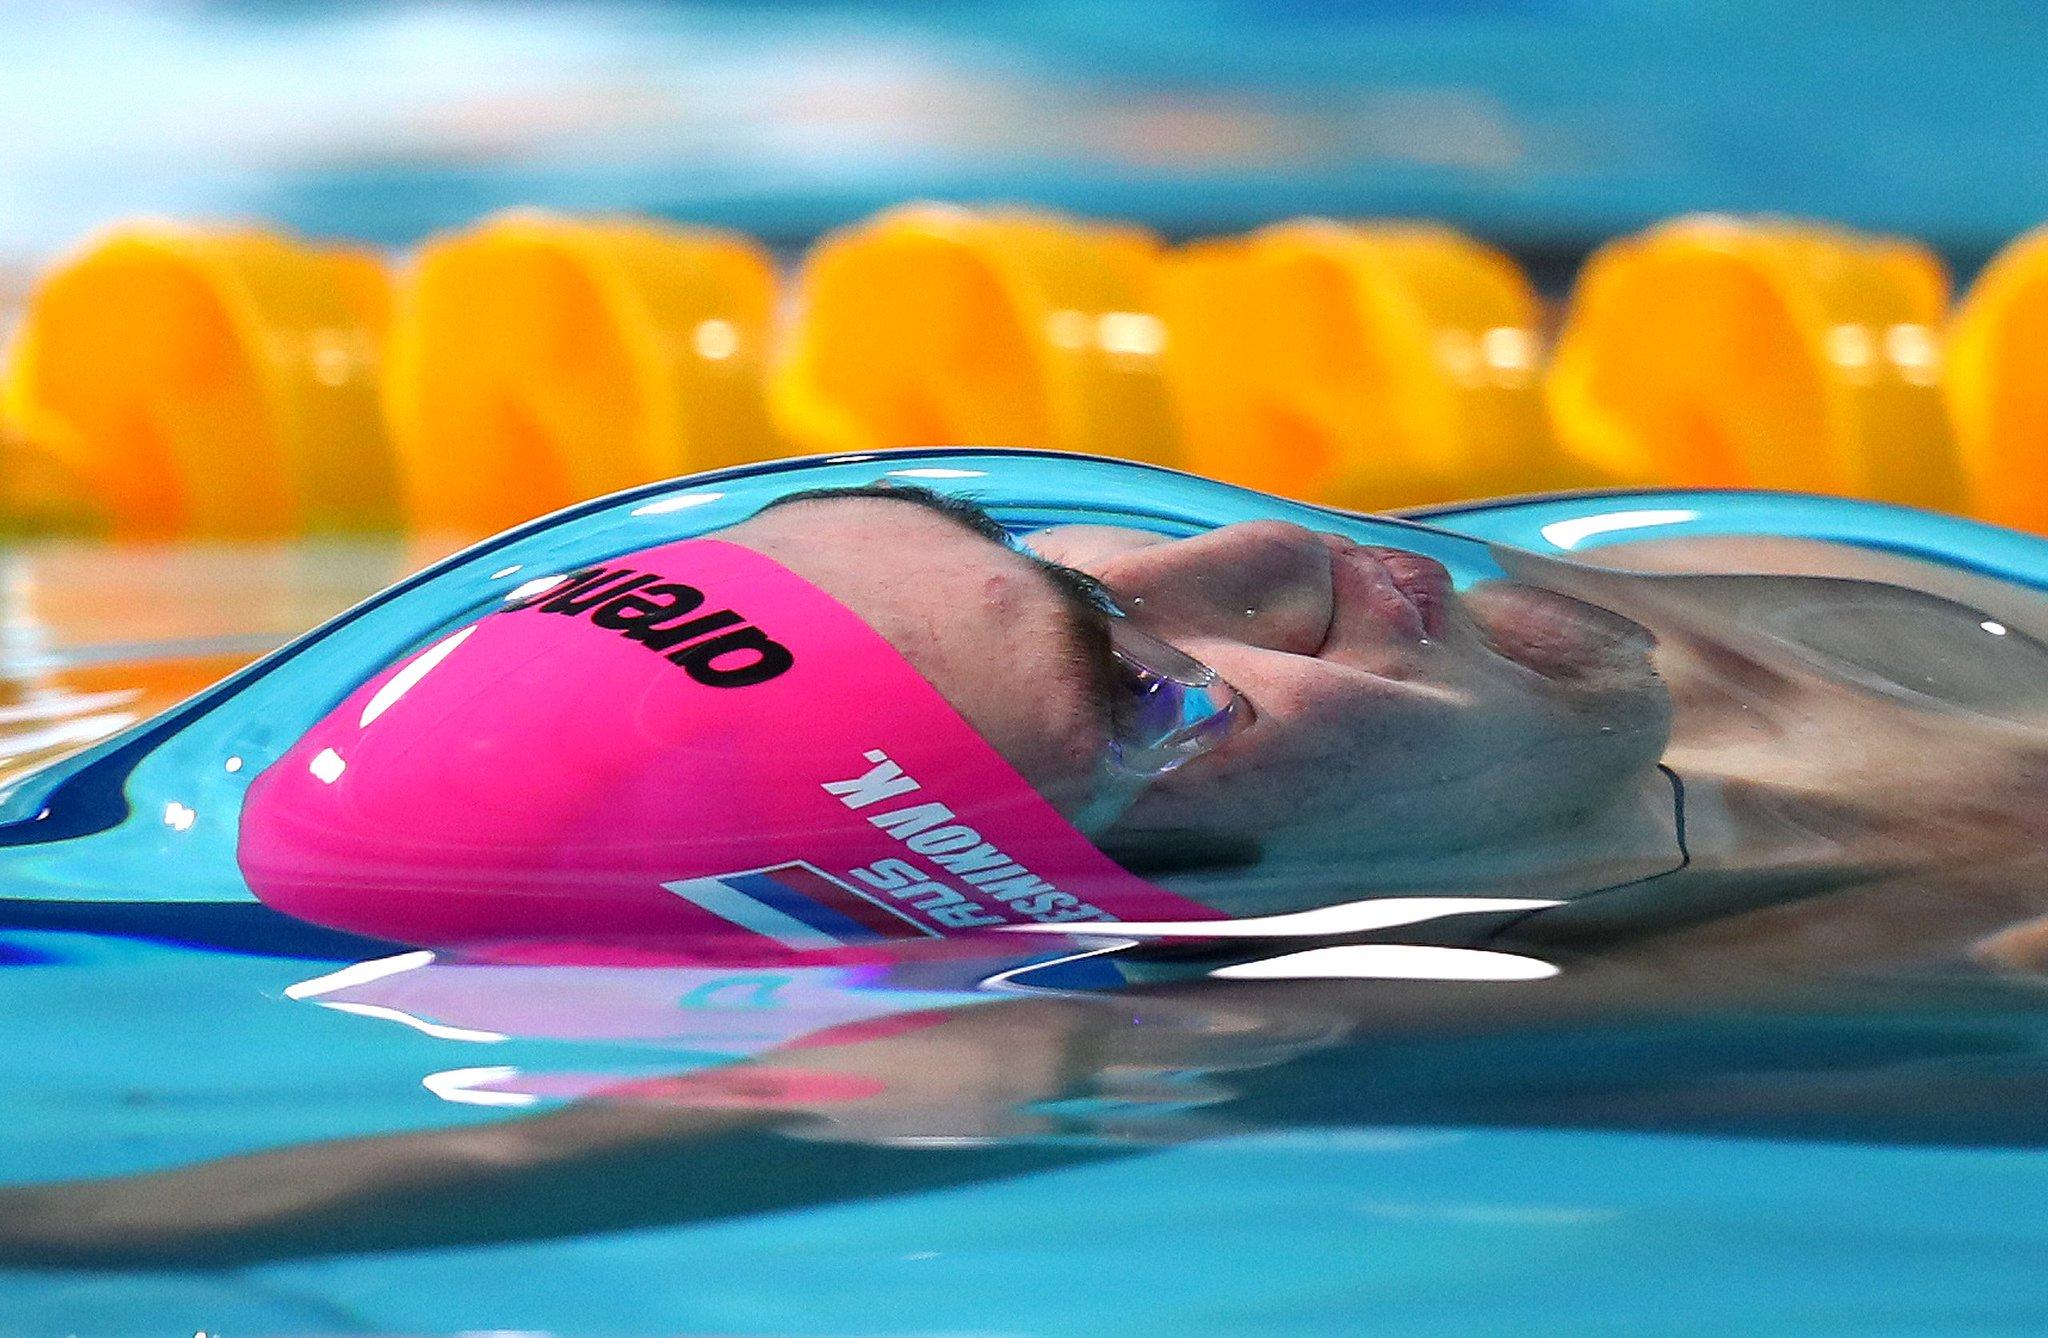 10 swimming photos that will leave you breathless https://t.co/yxTdGGNihj https://t.co/3C2iK5sj4N